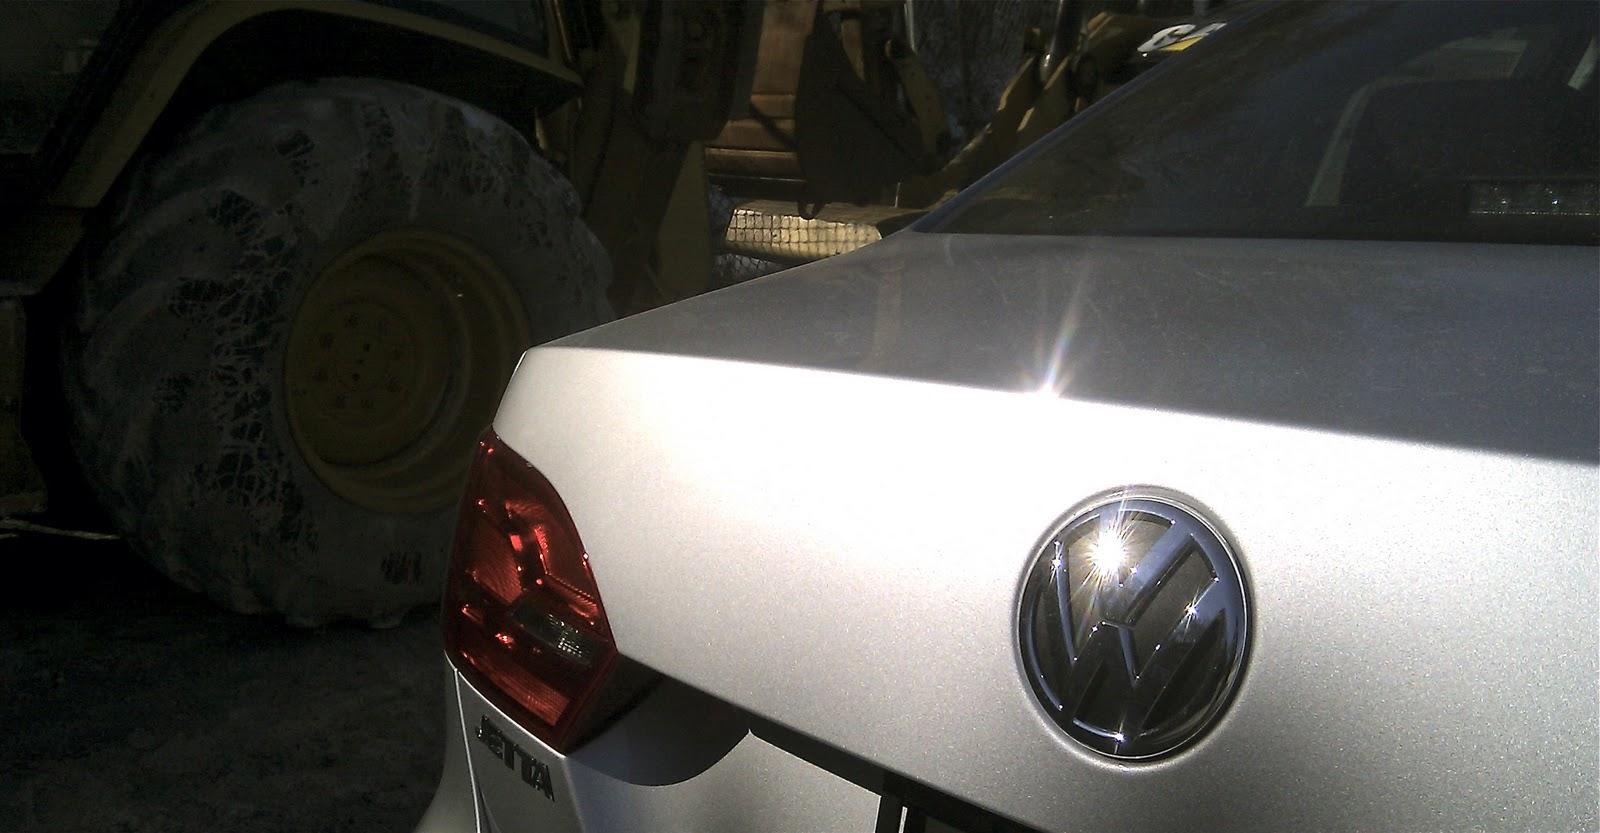 http://2.bp.blogspot.com/-o7lWoJacNn8/TWfy1jooyjI/AAAAAAAAR68/QhCv1hzBxUw/s1600/2011+Volkswagen+Jetta+TDI+Badges.jpg